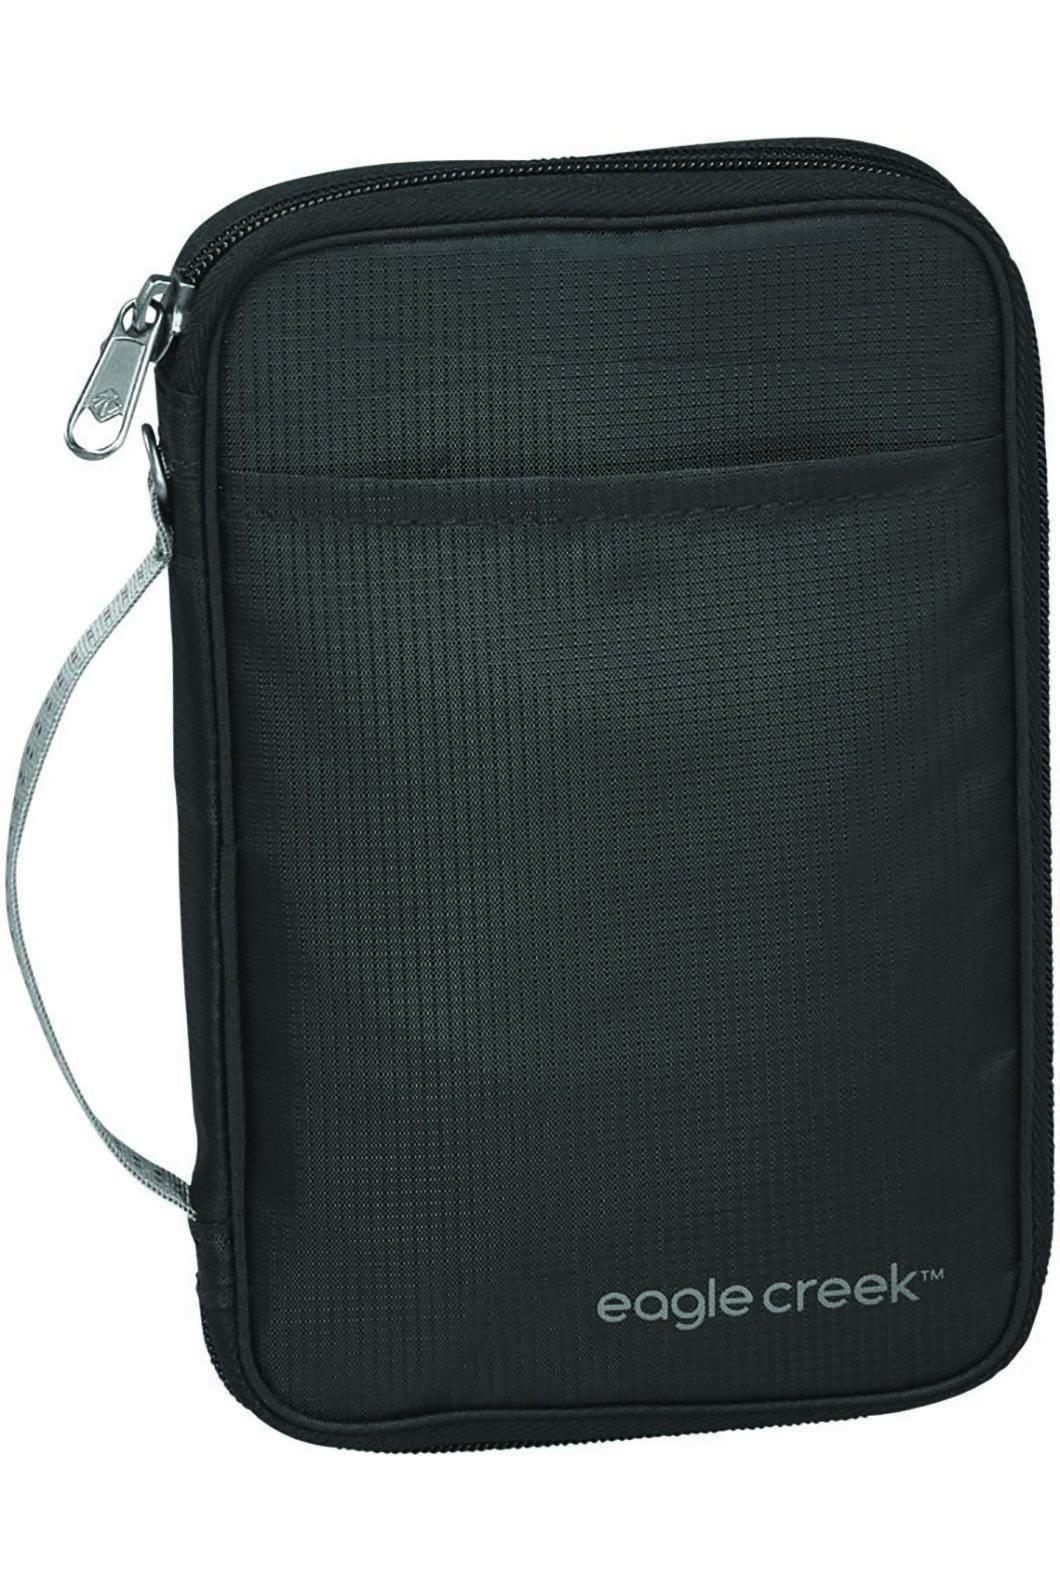 Eagle Creek RFID Travel Zip Organizer, None, hi-res